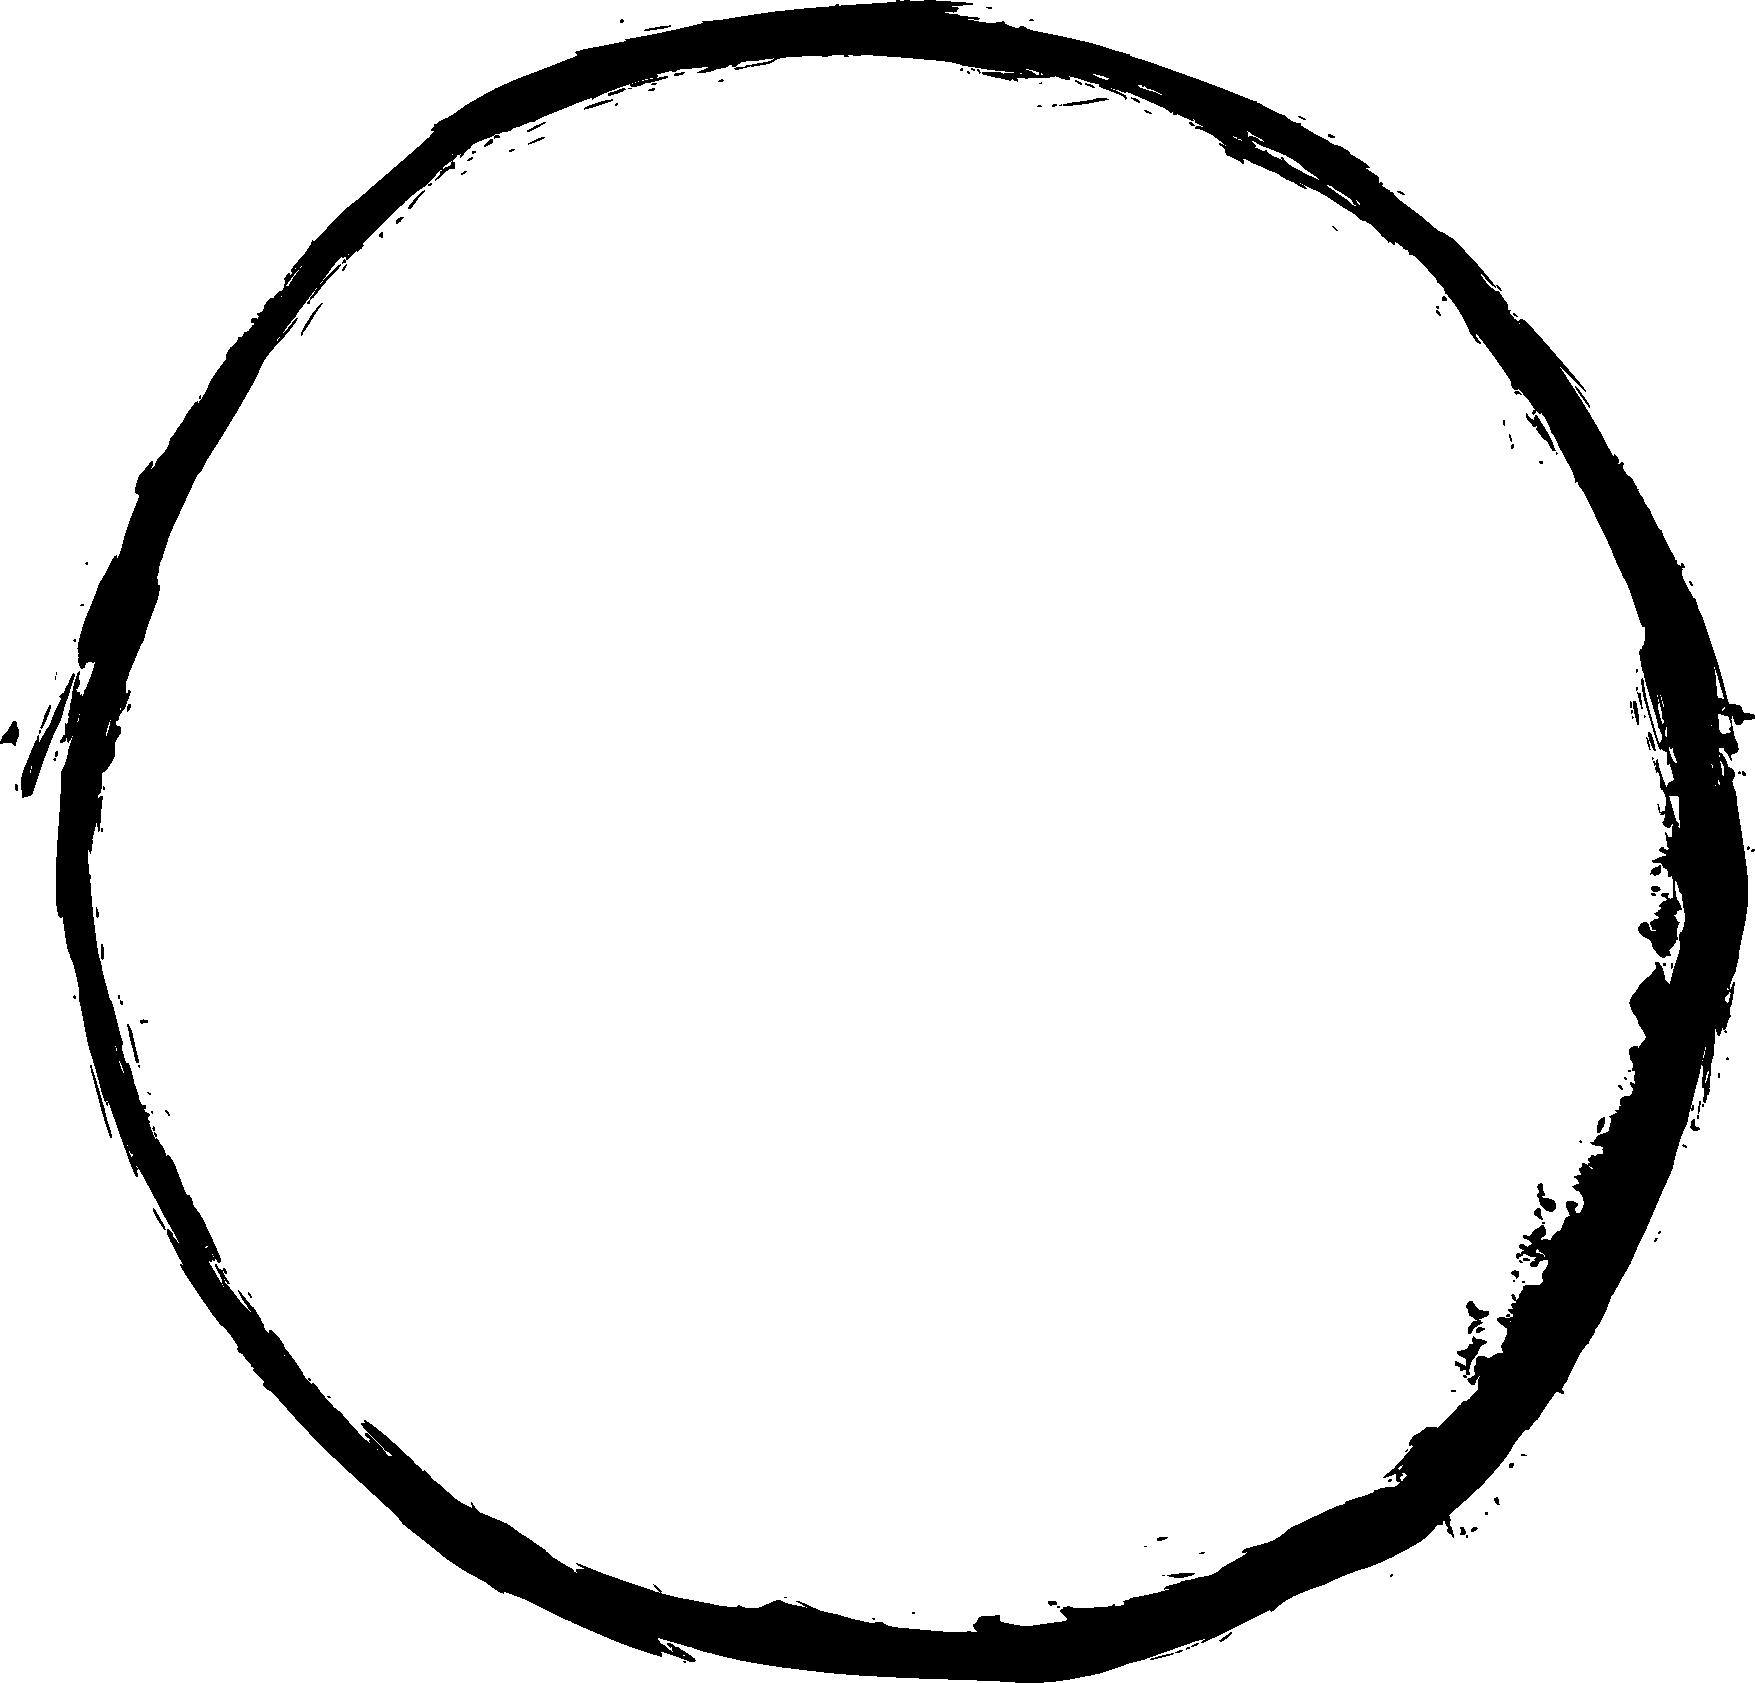 Transparent circle clip art - Grunge Frame - Transparent Background Circle Frame Png